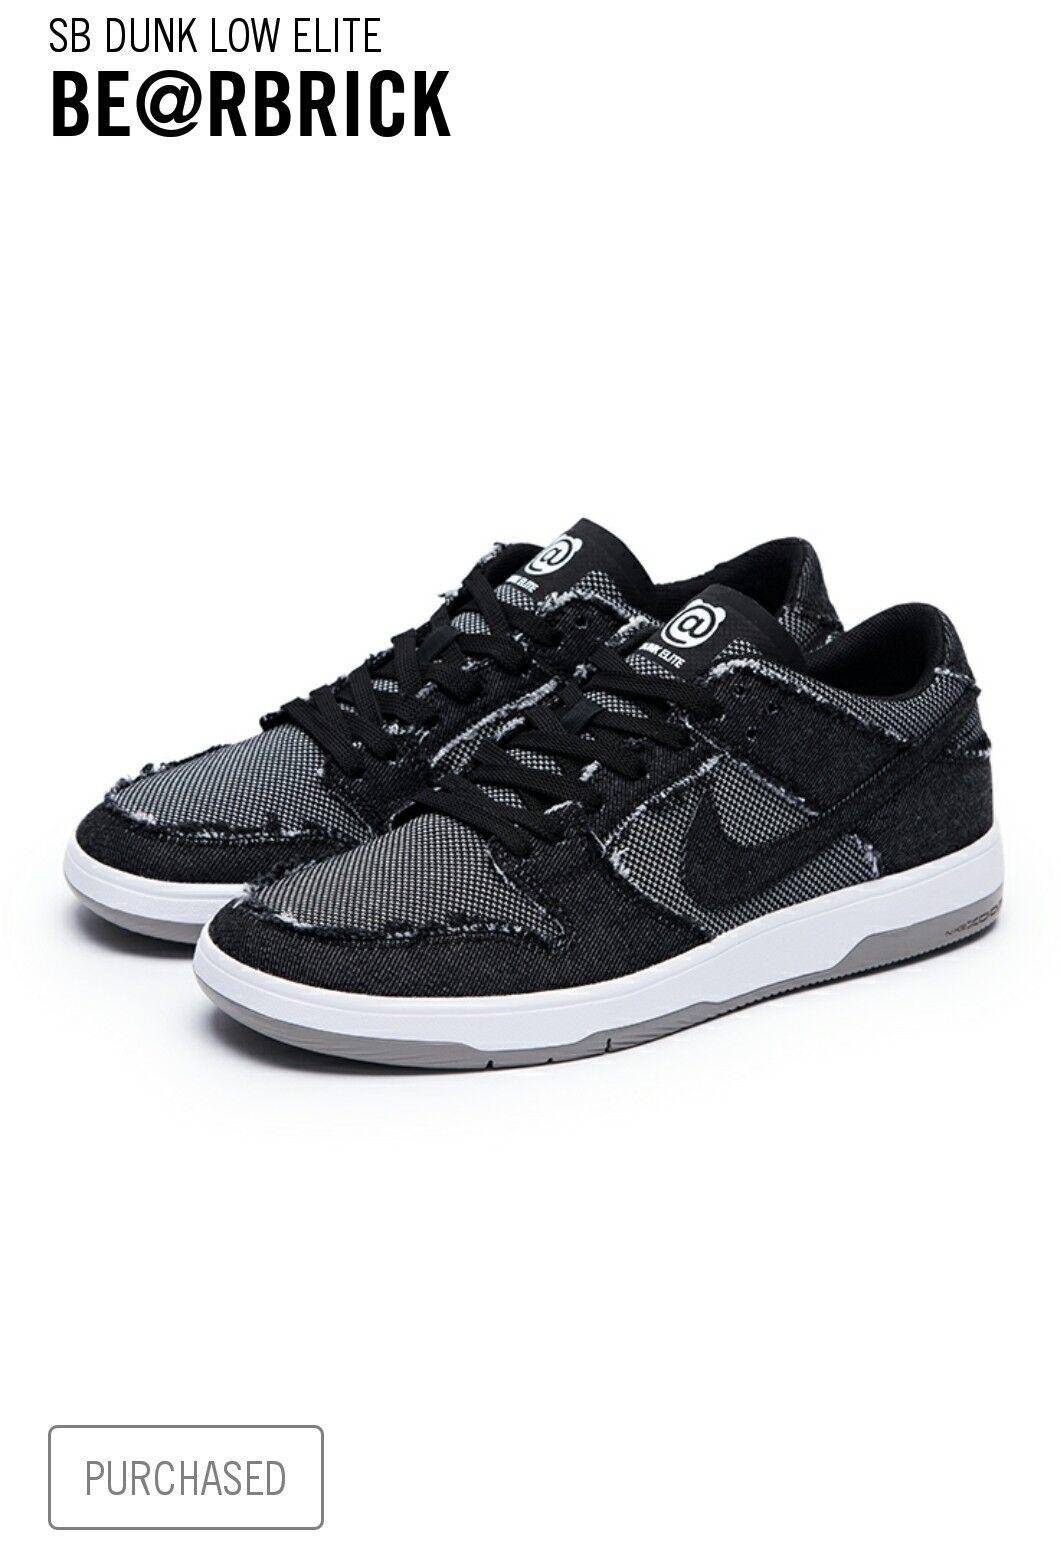 Nike SB x Medicom Zoom Dunk Low Elite QS Sz 11 US * SECURED PAIR * Bearbrick